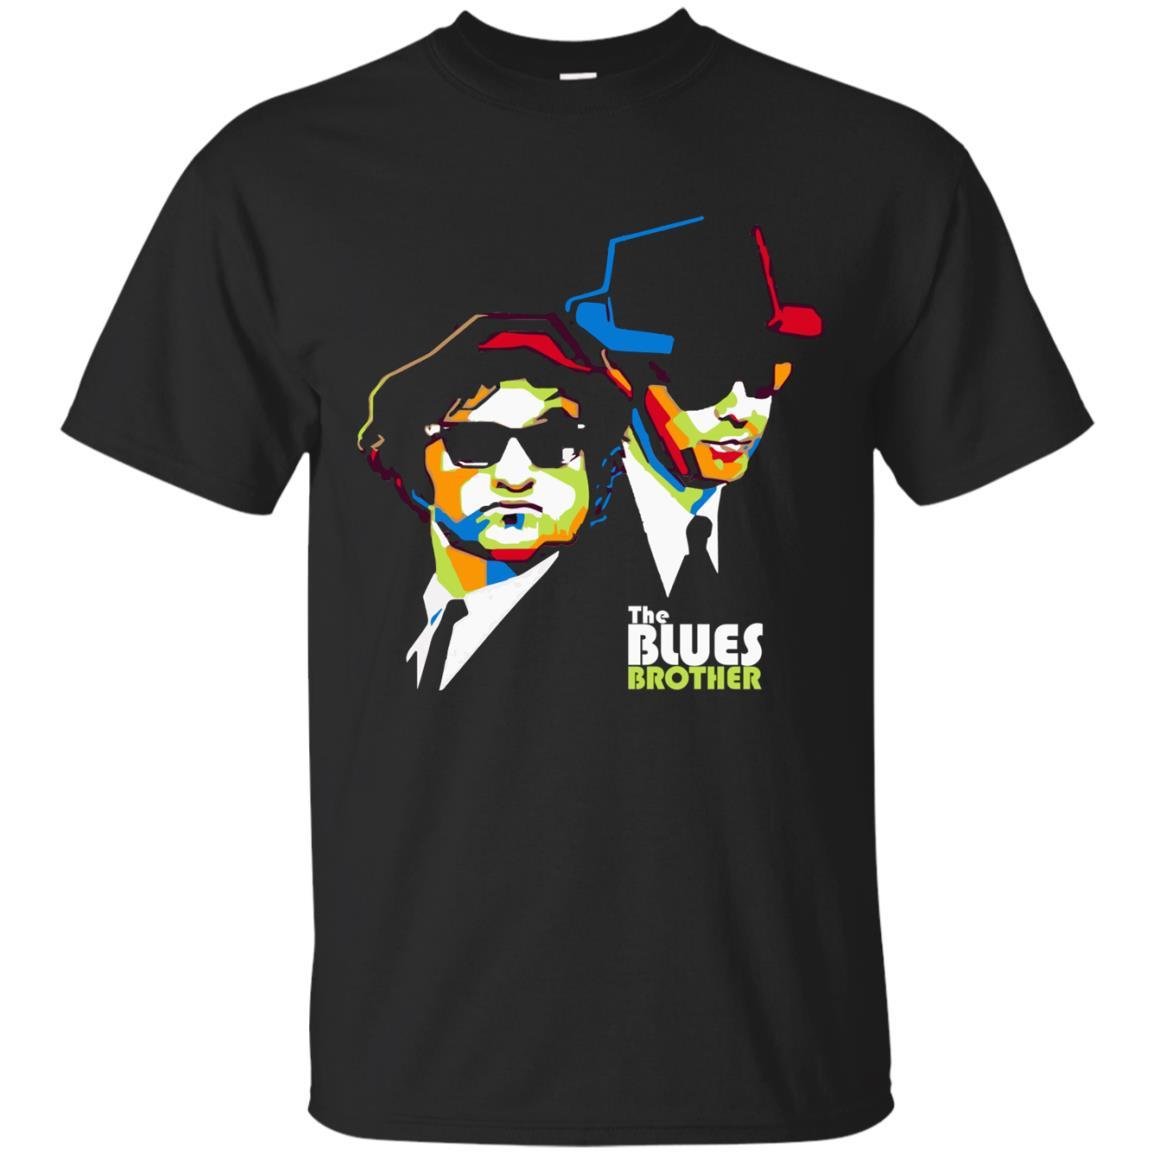 image 639 - The Blues Brother Shirt, Sweatshirt, Hoodie